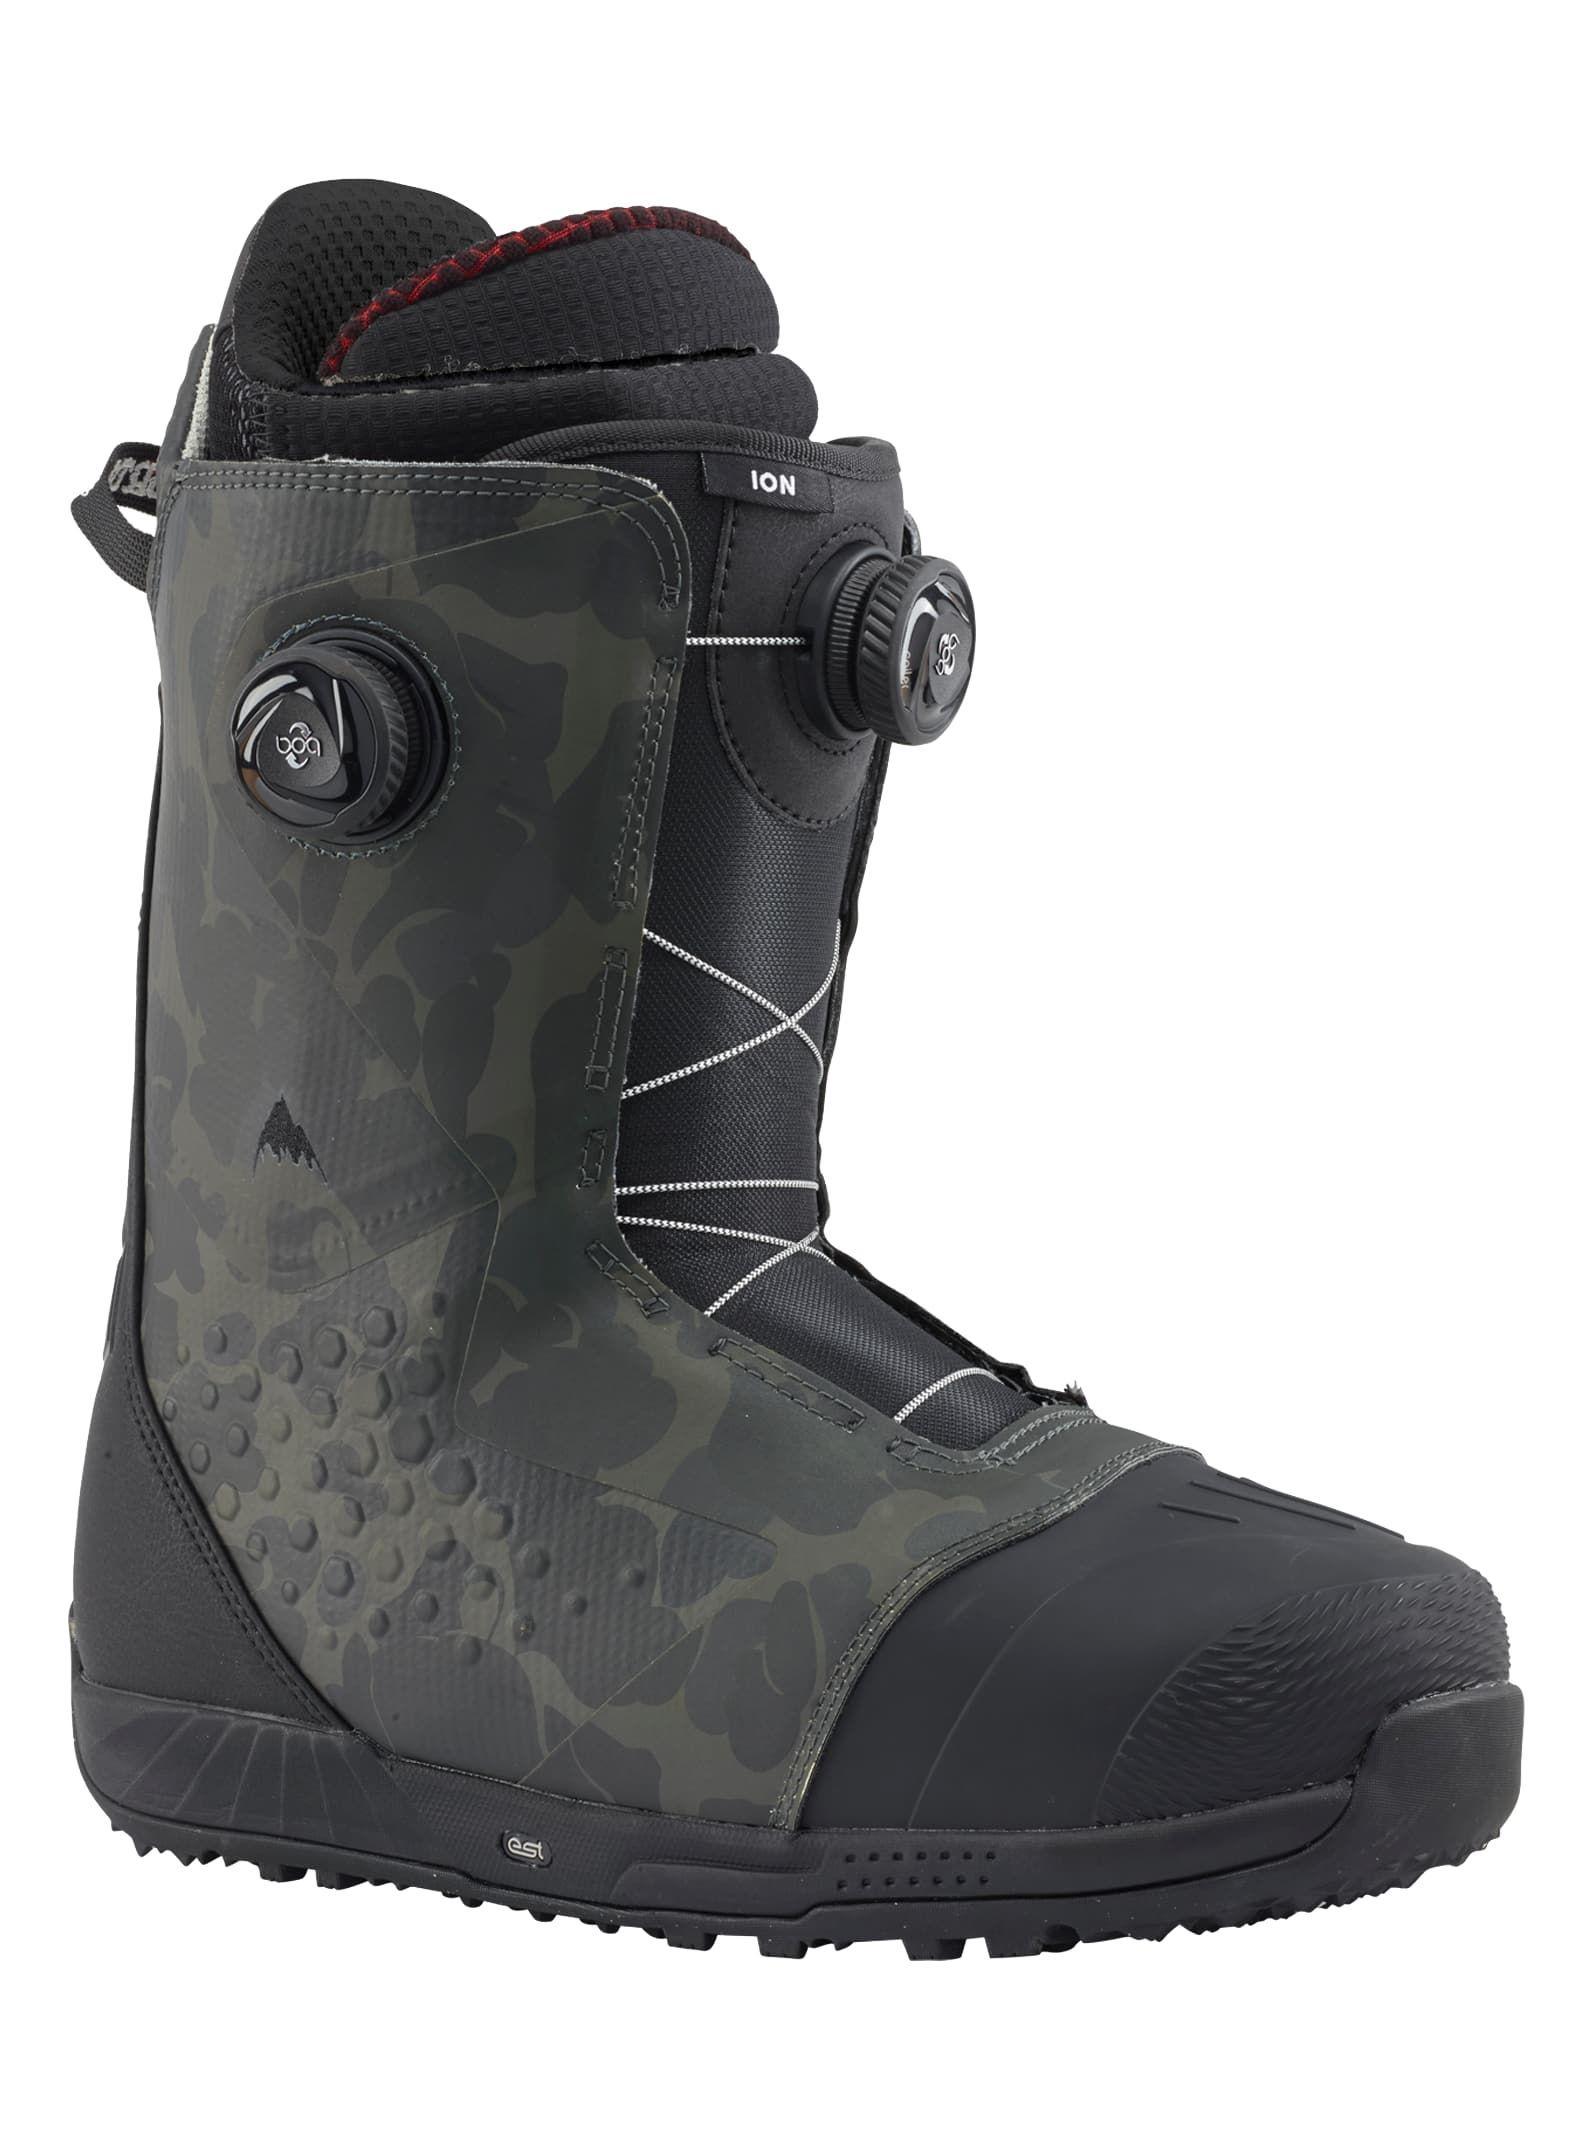 330d117d14 Men's Burton Ion Boa® Snowboard Boot | Products | Snowboard ...